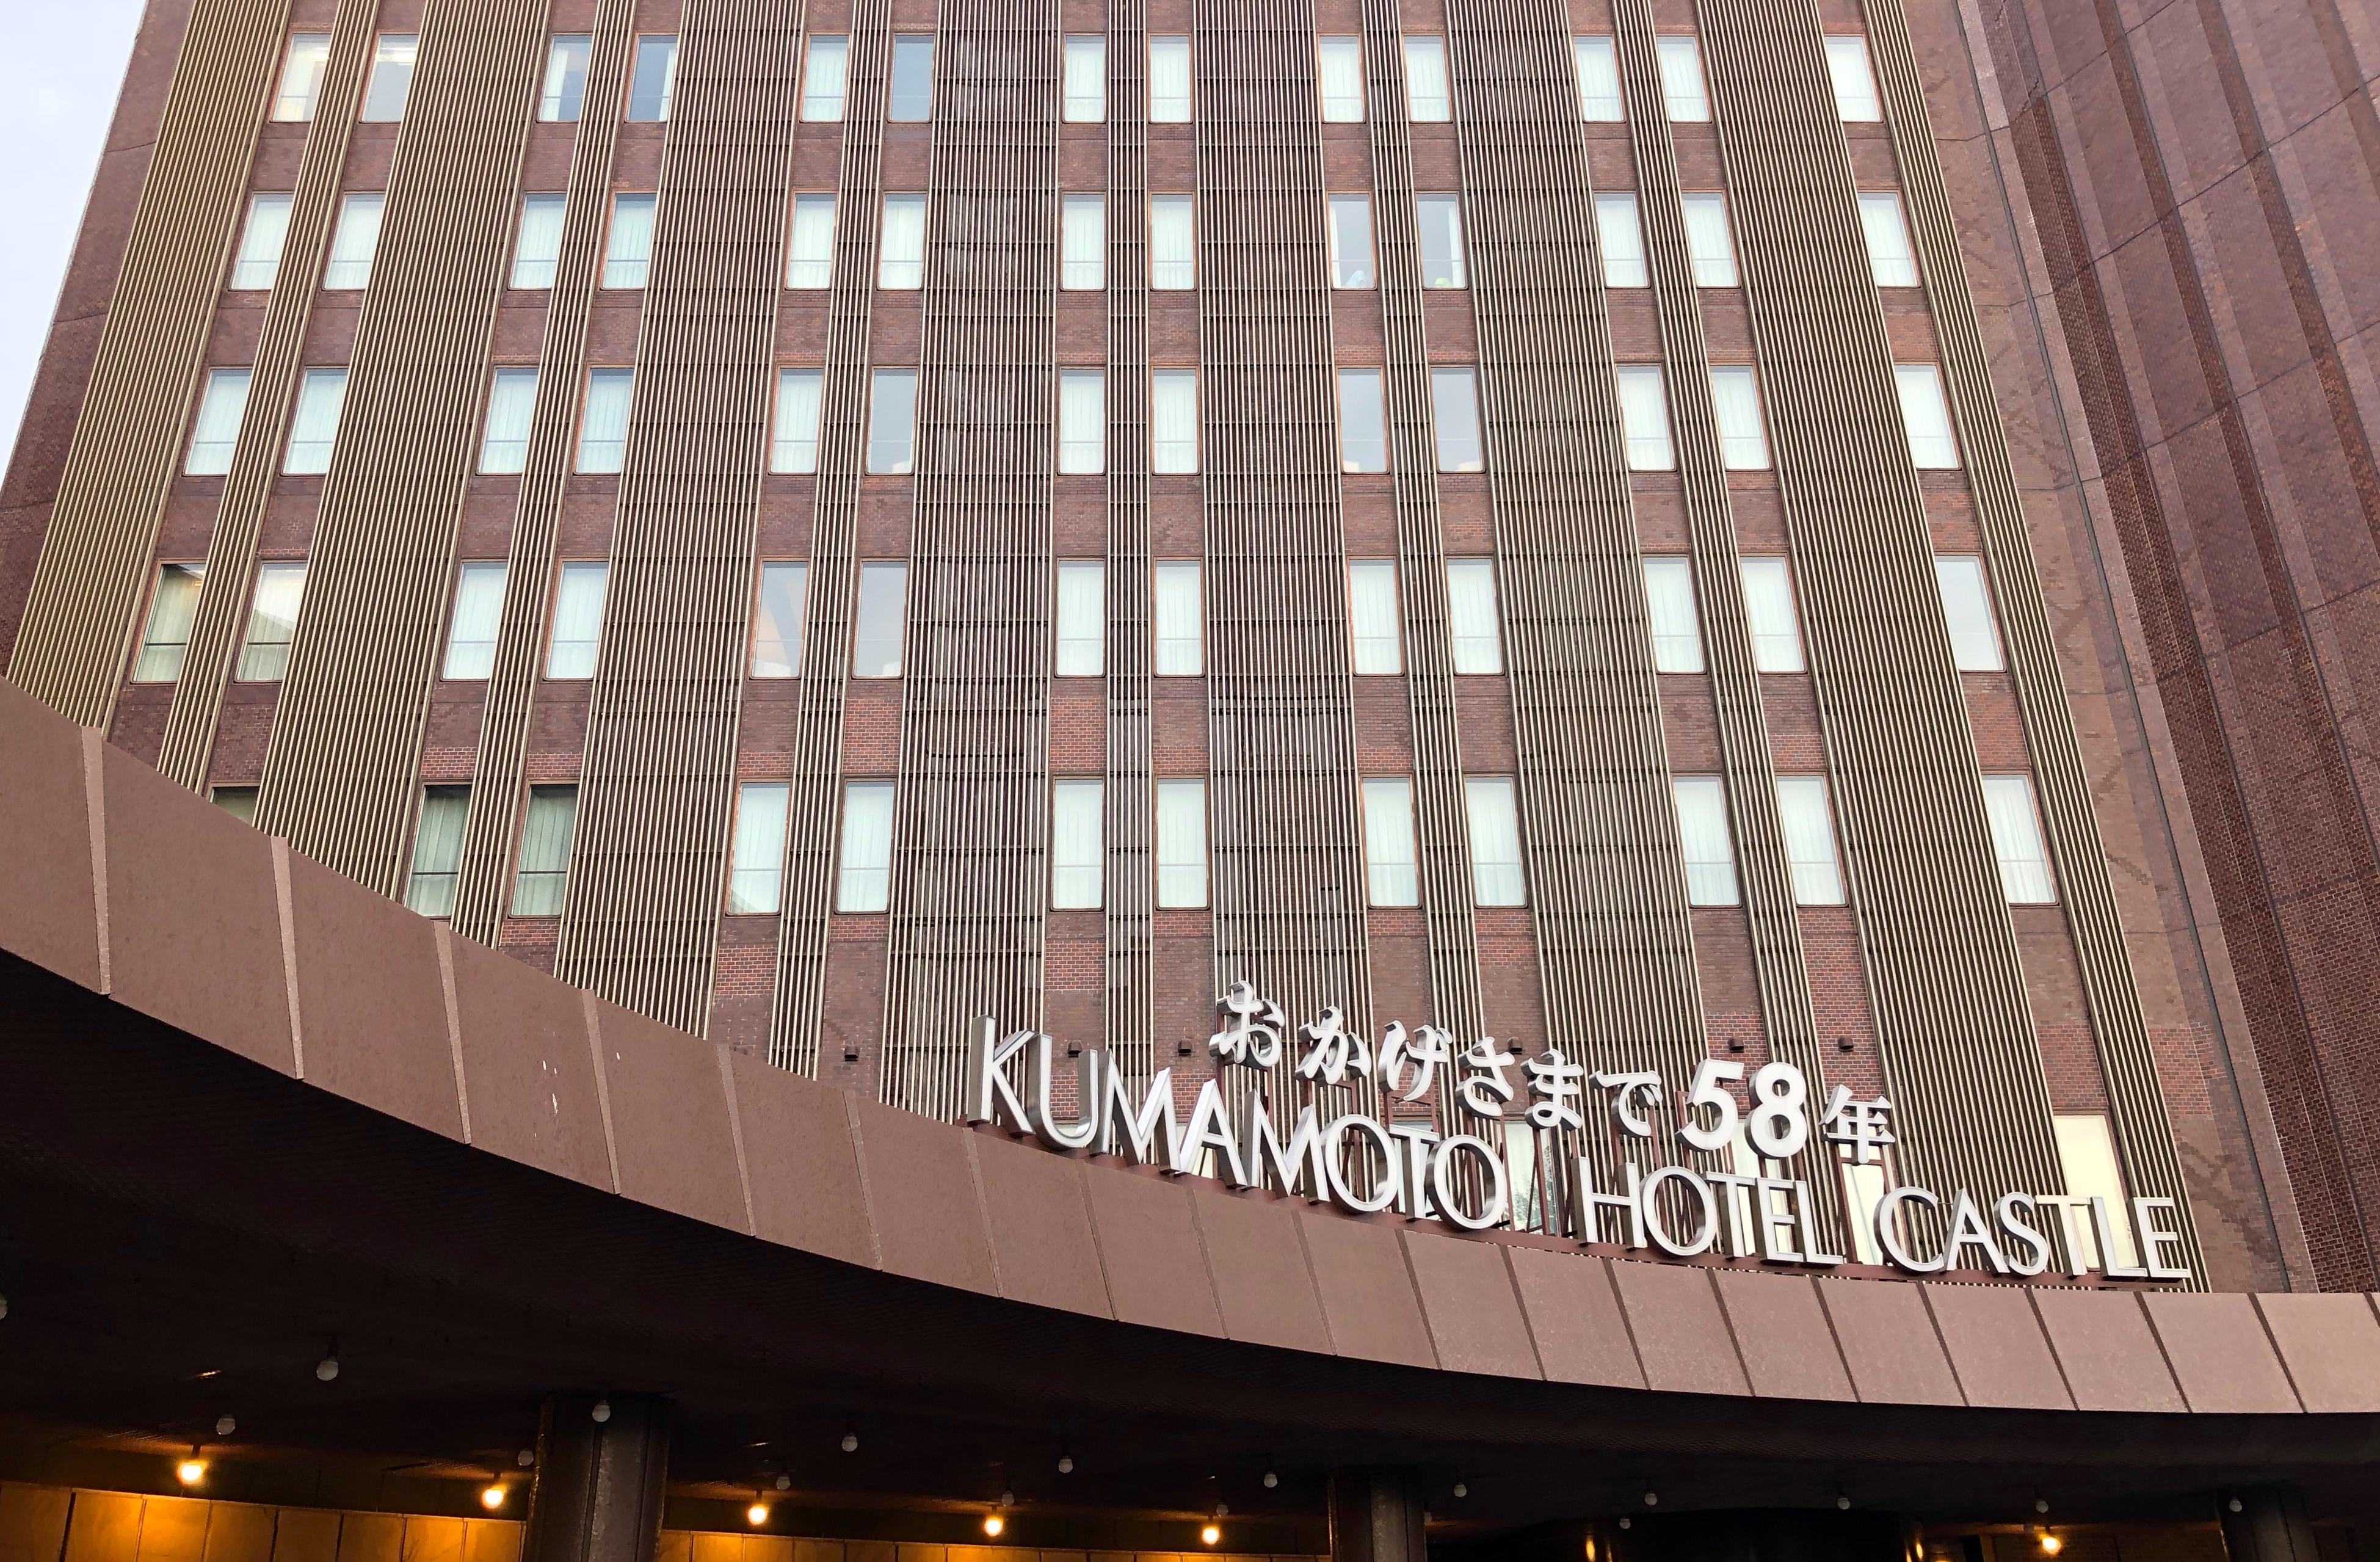 kumamoto city, Japan, 2018 139